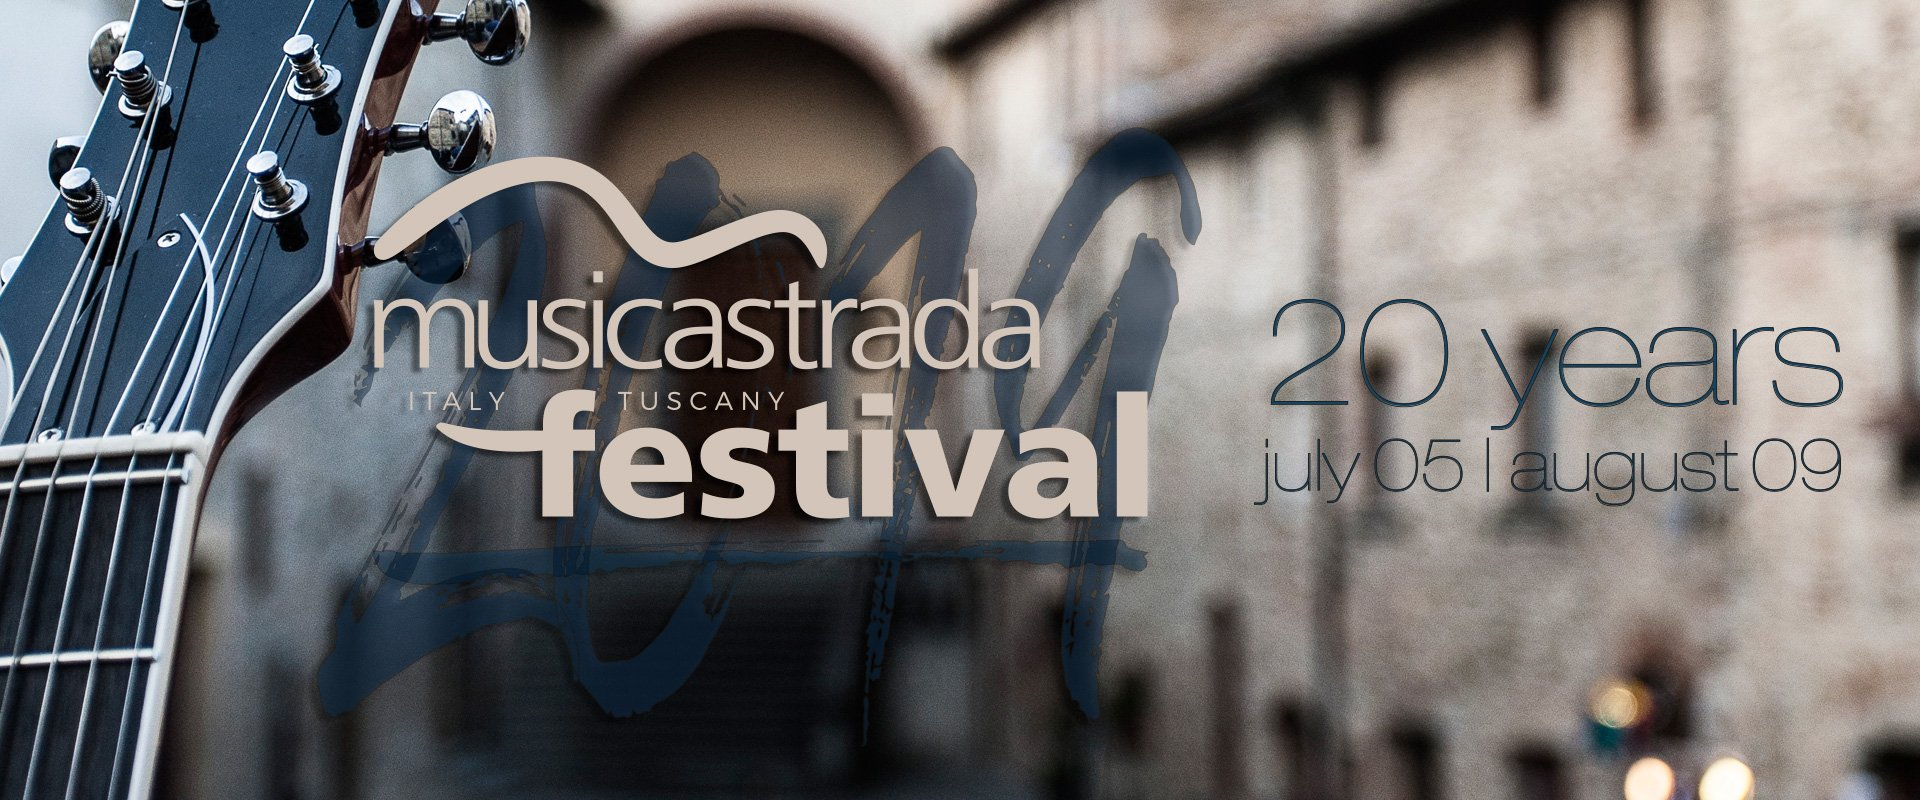 musicastradafestival2019_banner_homesito